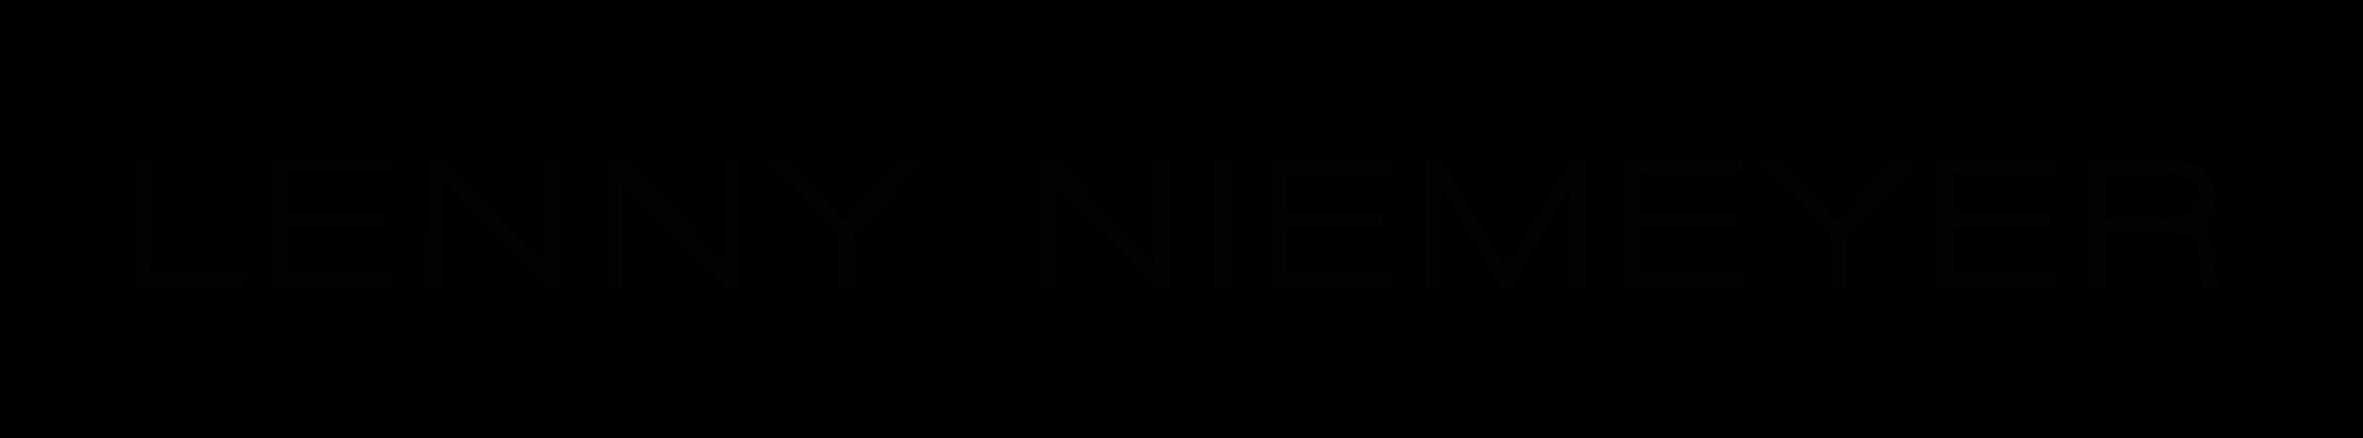 Lenny Niemeyer